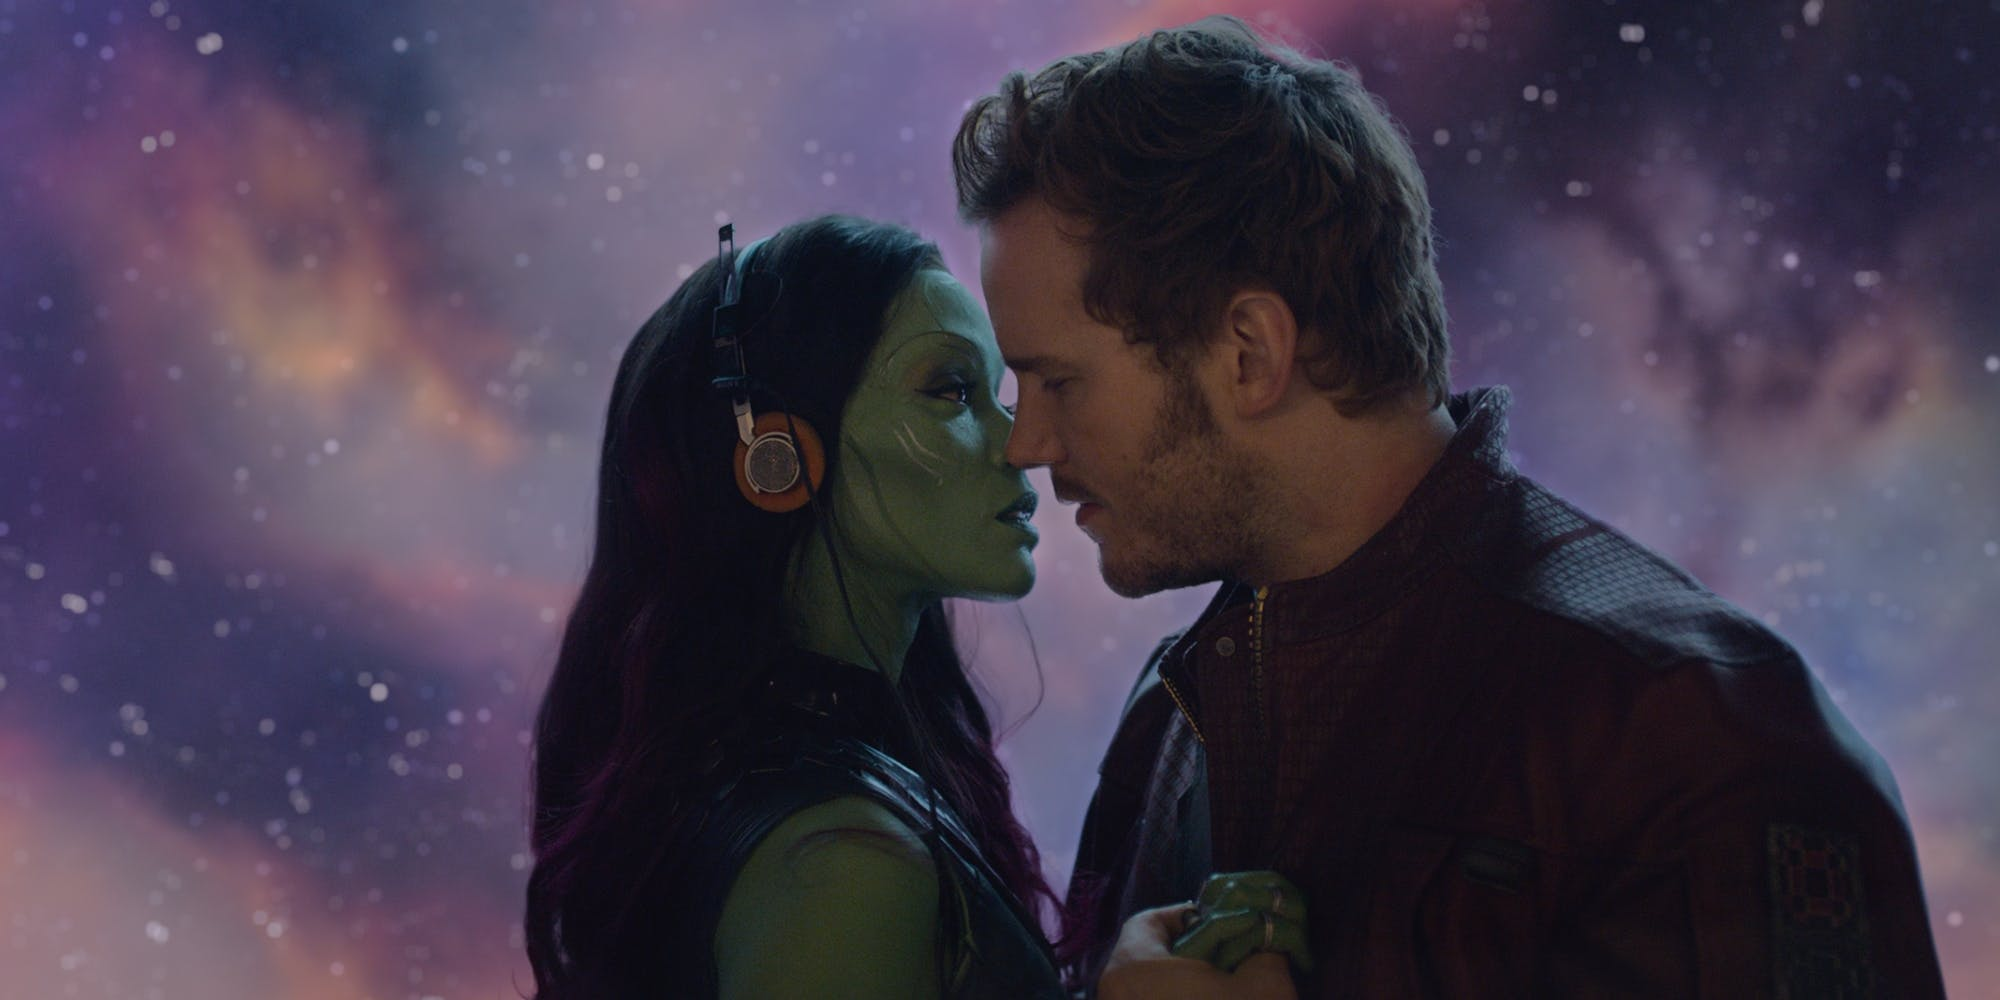 gamora-star-lord-guardians-of-the-galaxy.jpg